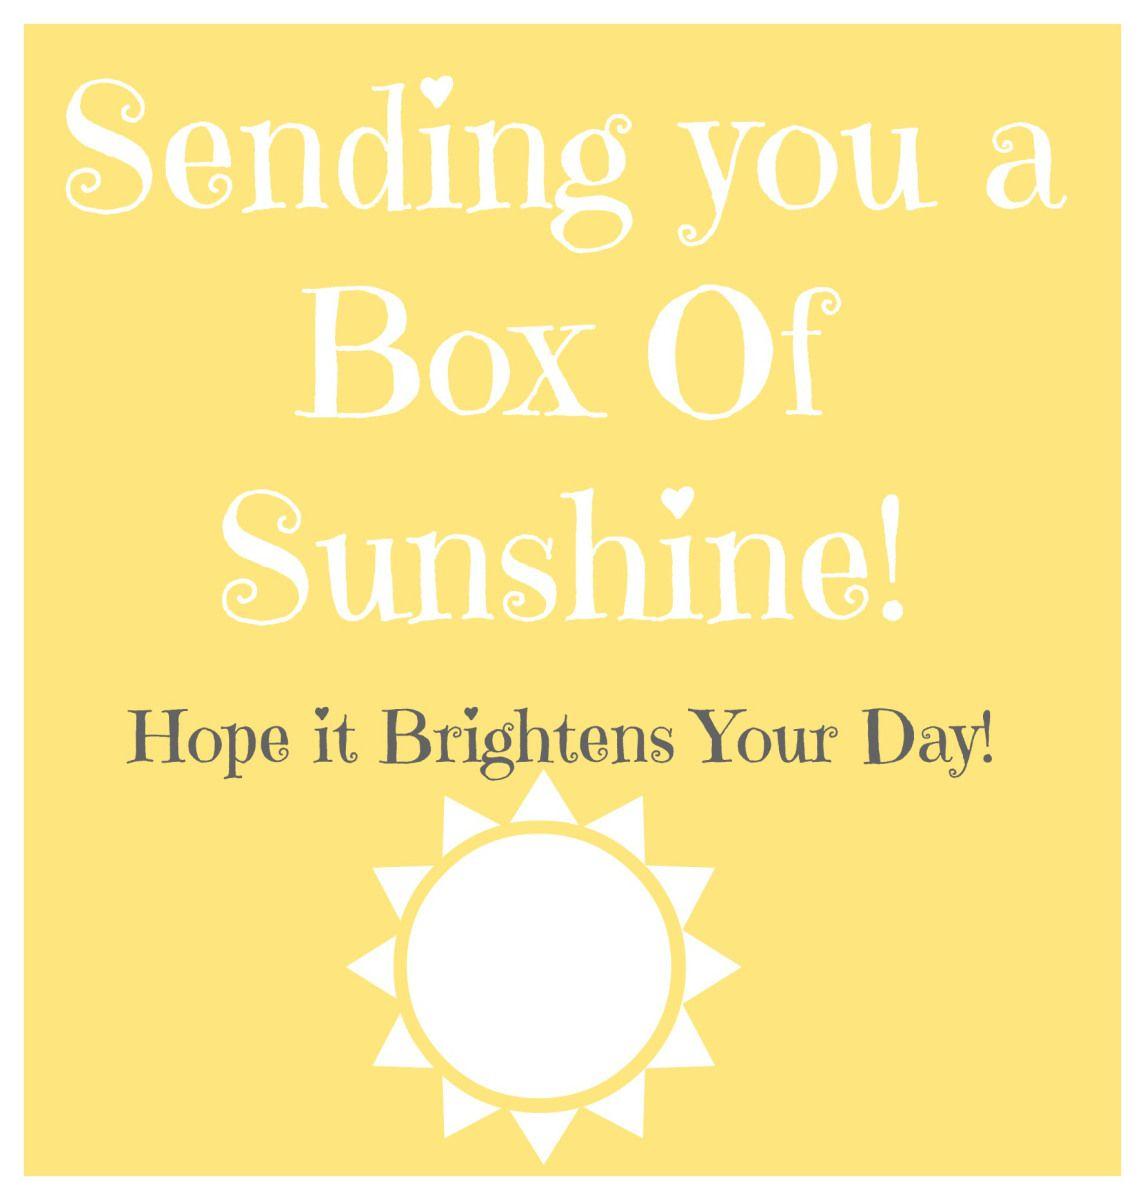 Box Of Sunshine // Free Printable // Rae Of Sparkles | Gift Ideas - Box Of Sunshine Free Printable